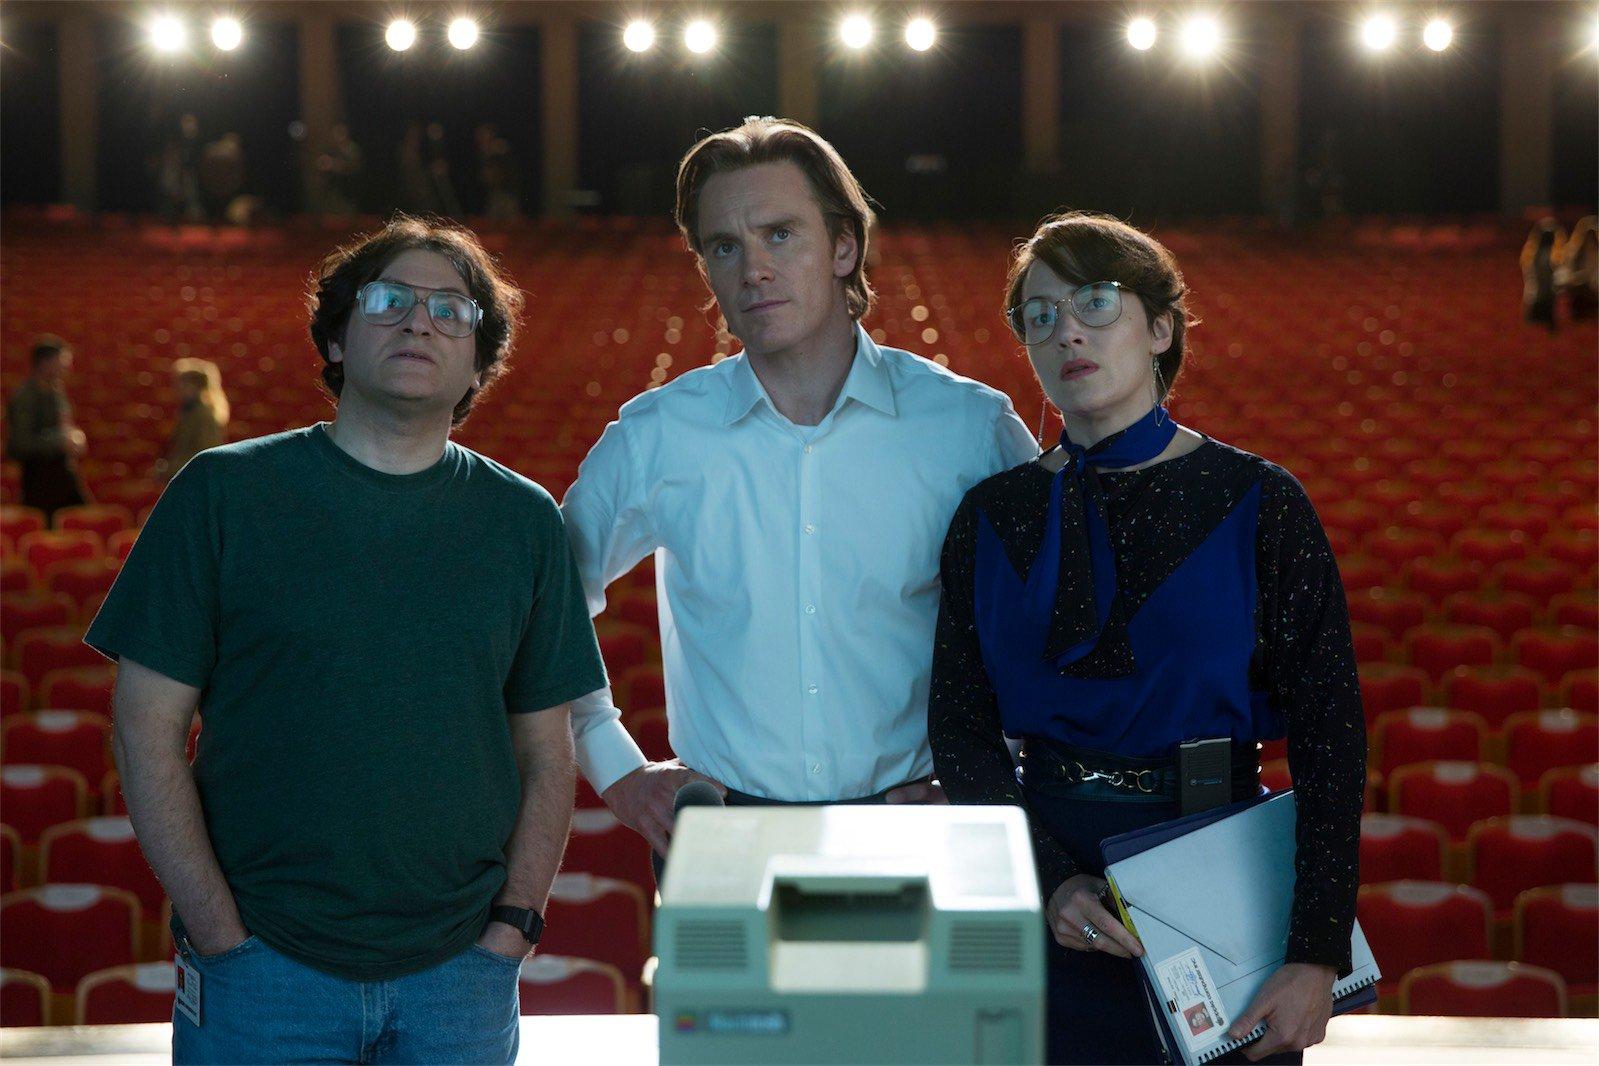 Risultati immagini per steve jobs film